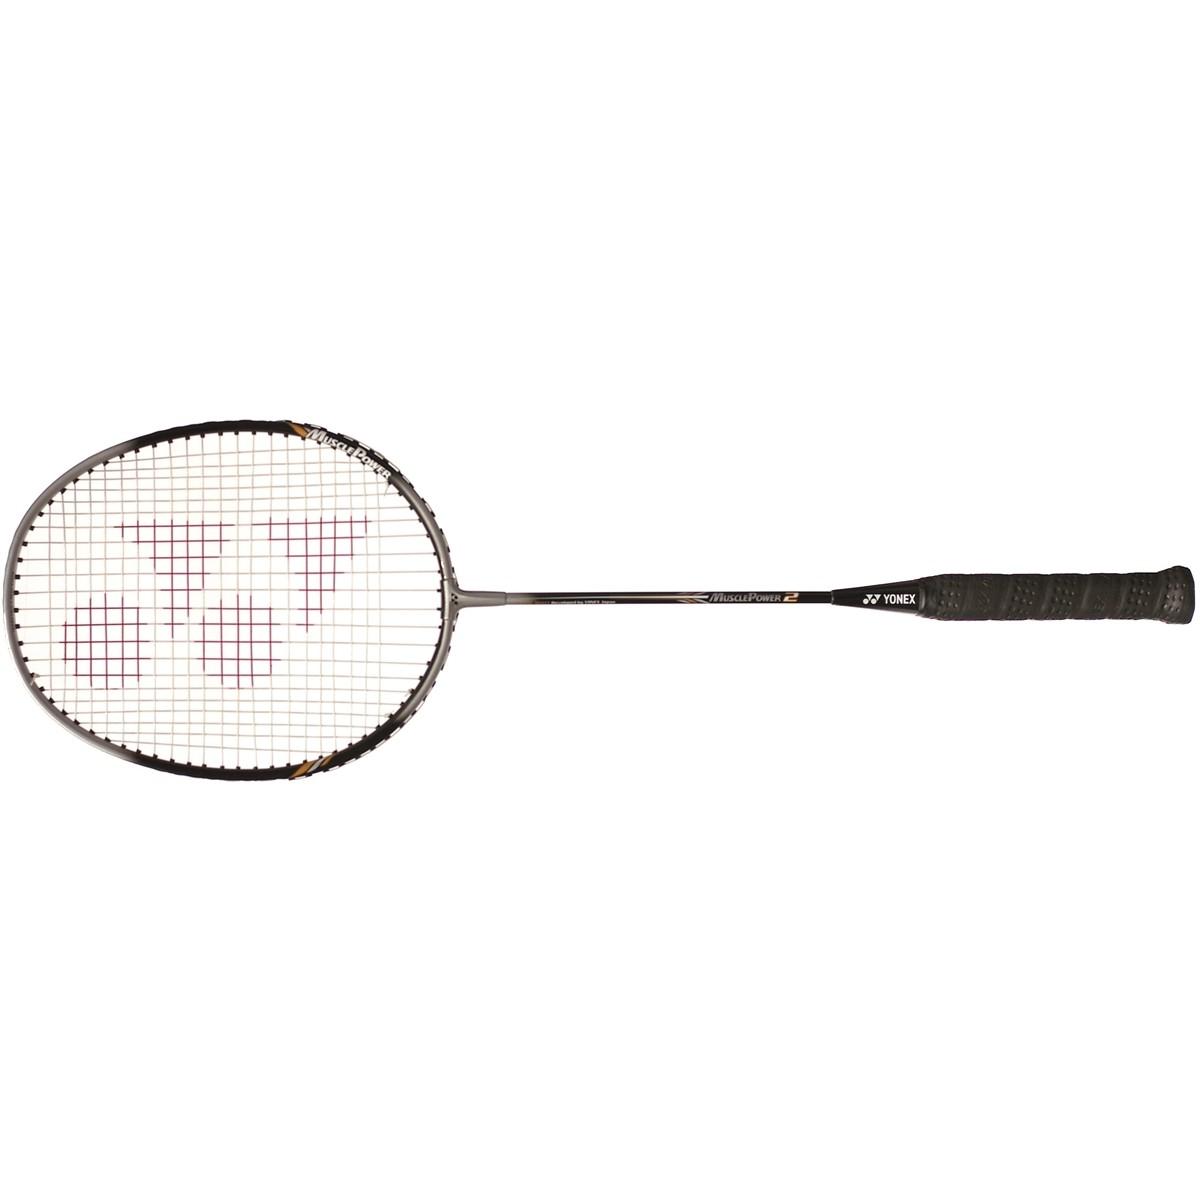 Badminton racket Yonex Muscle Power 2